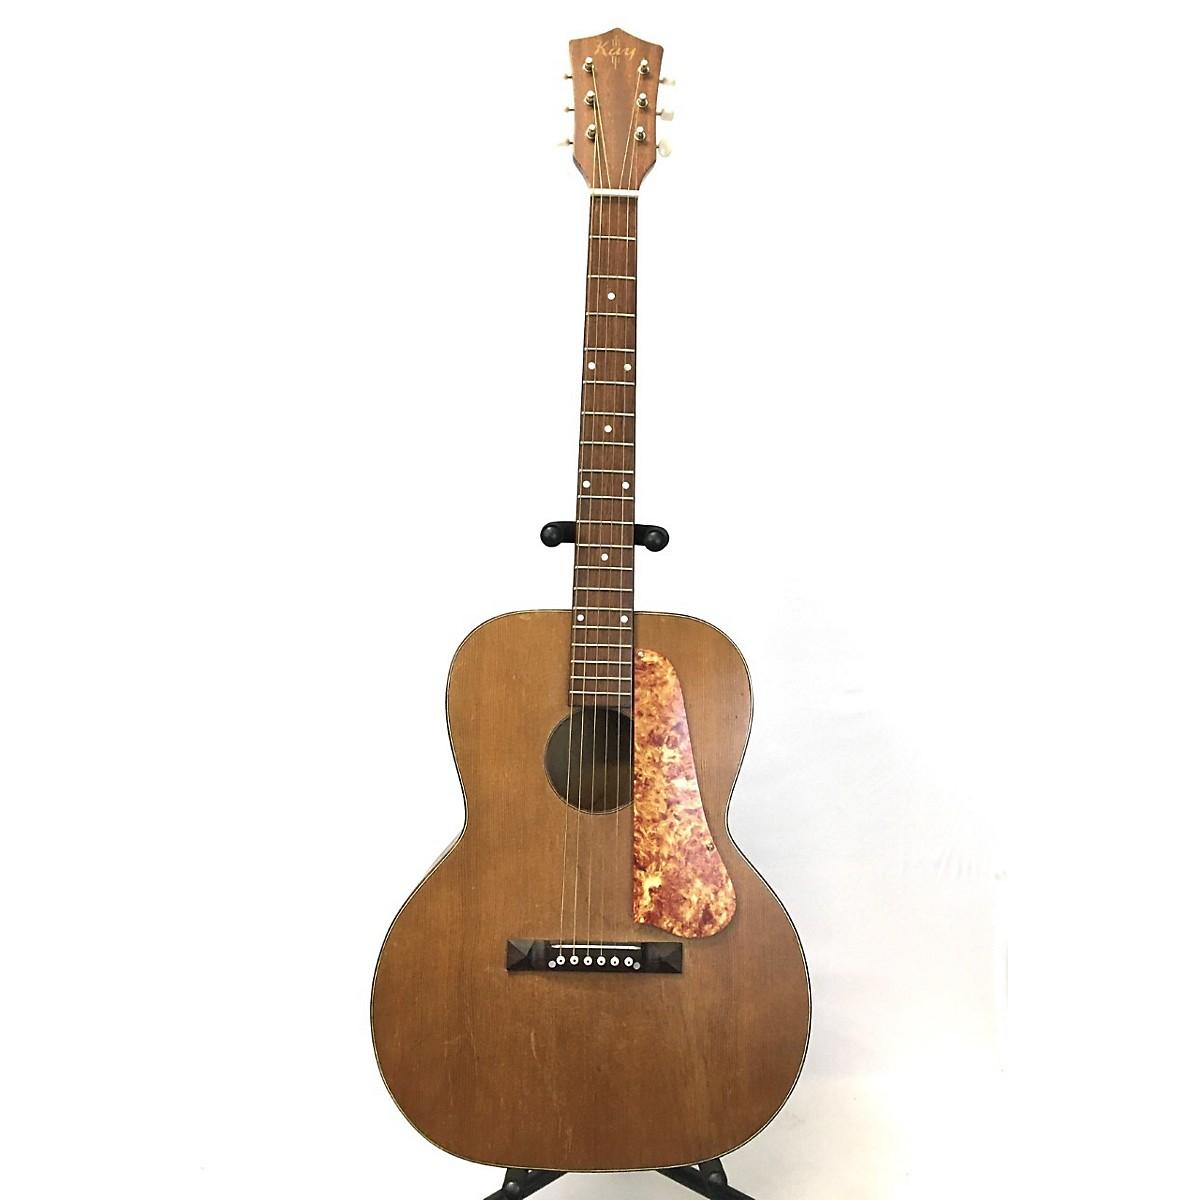 Kay 1940s K8 Acoustic Guitar